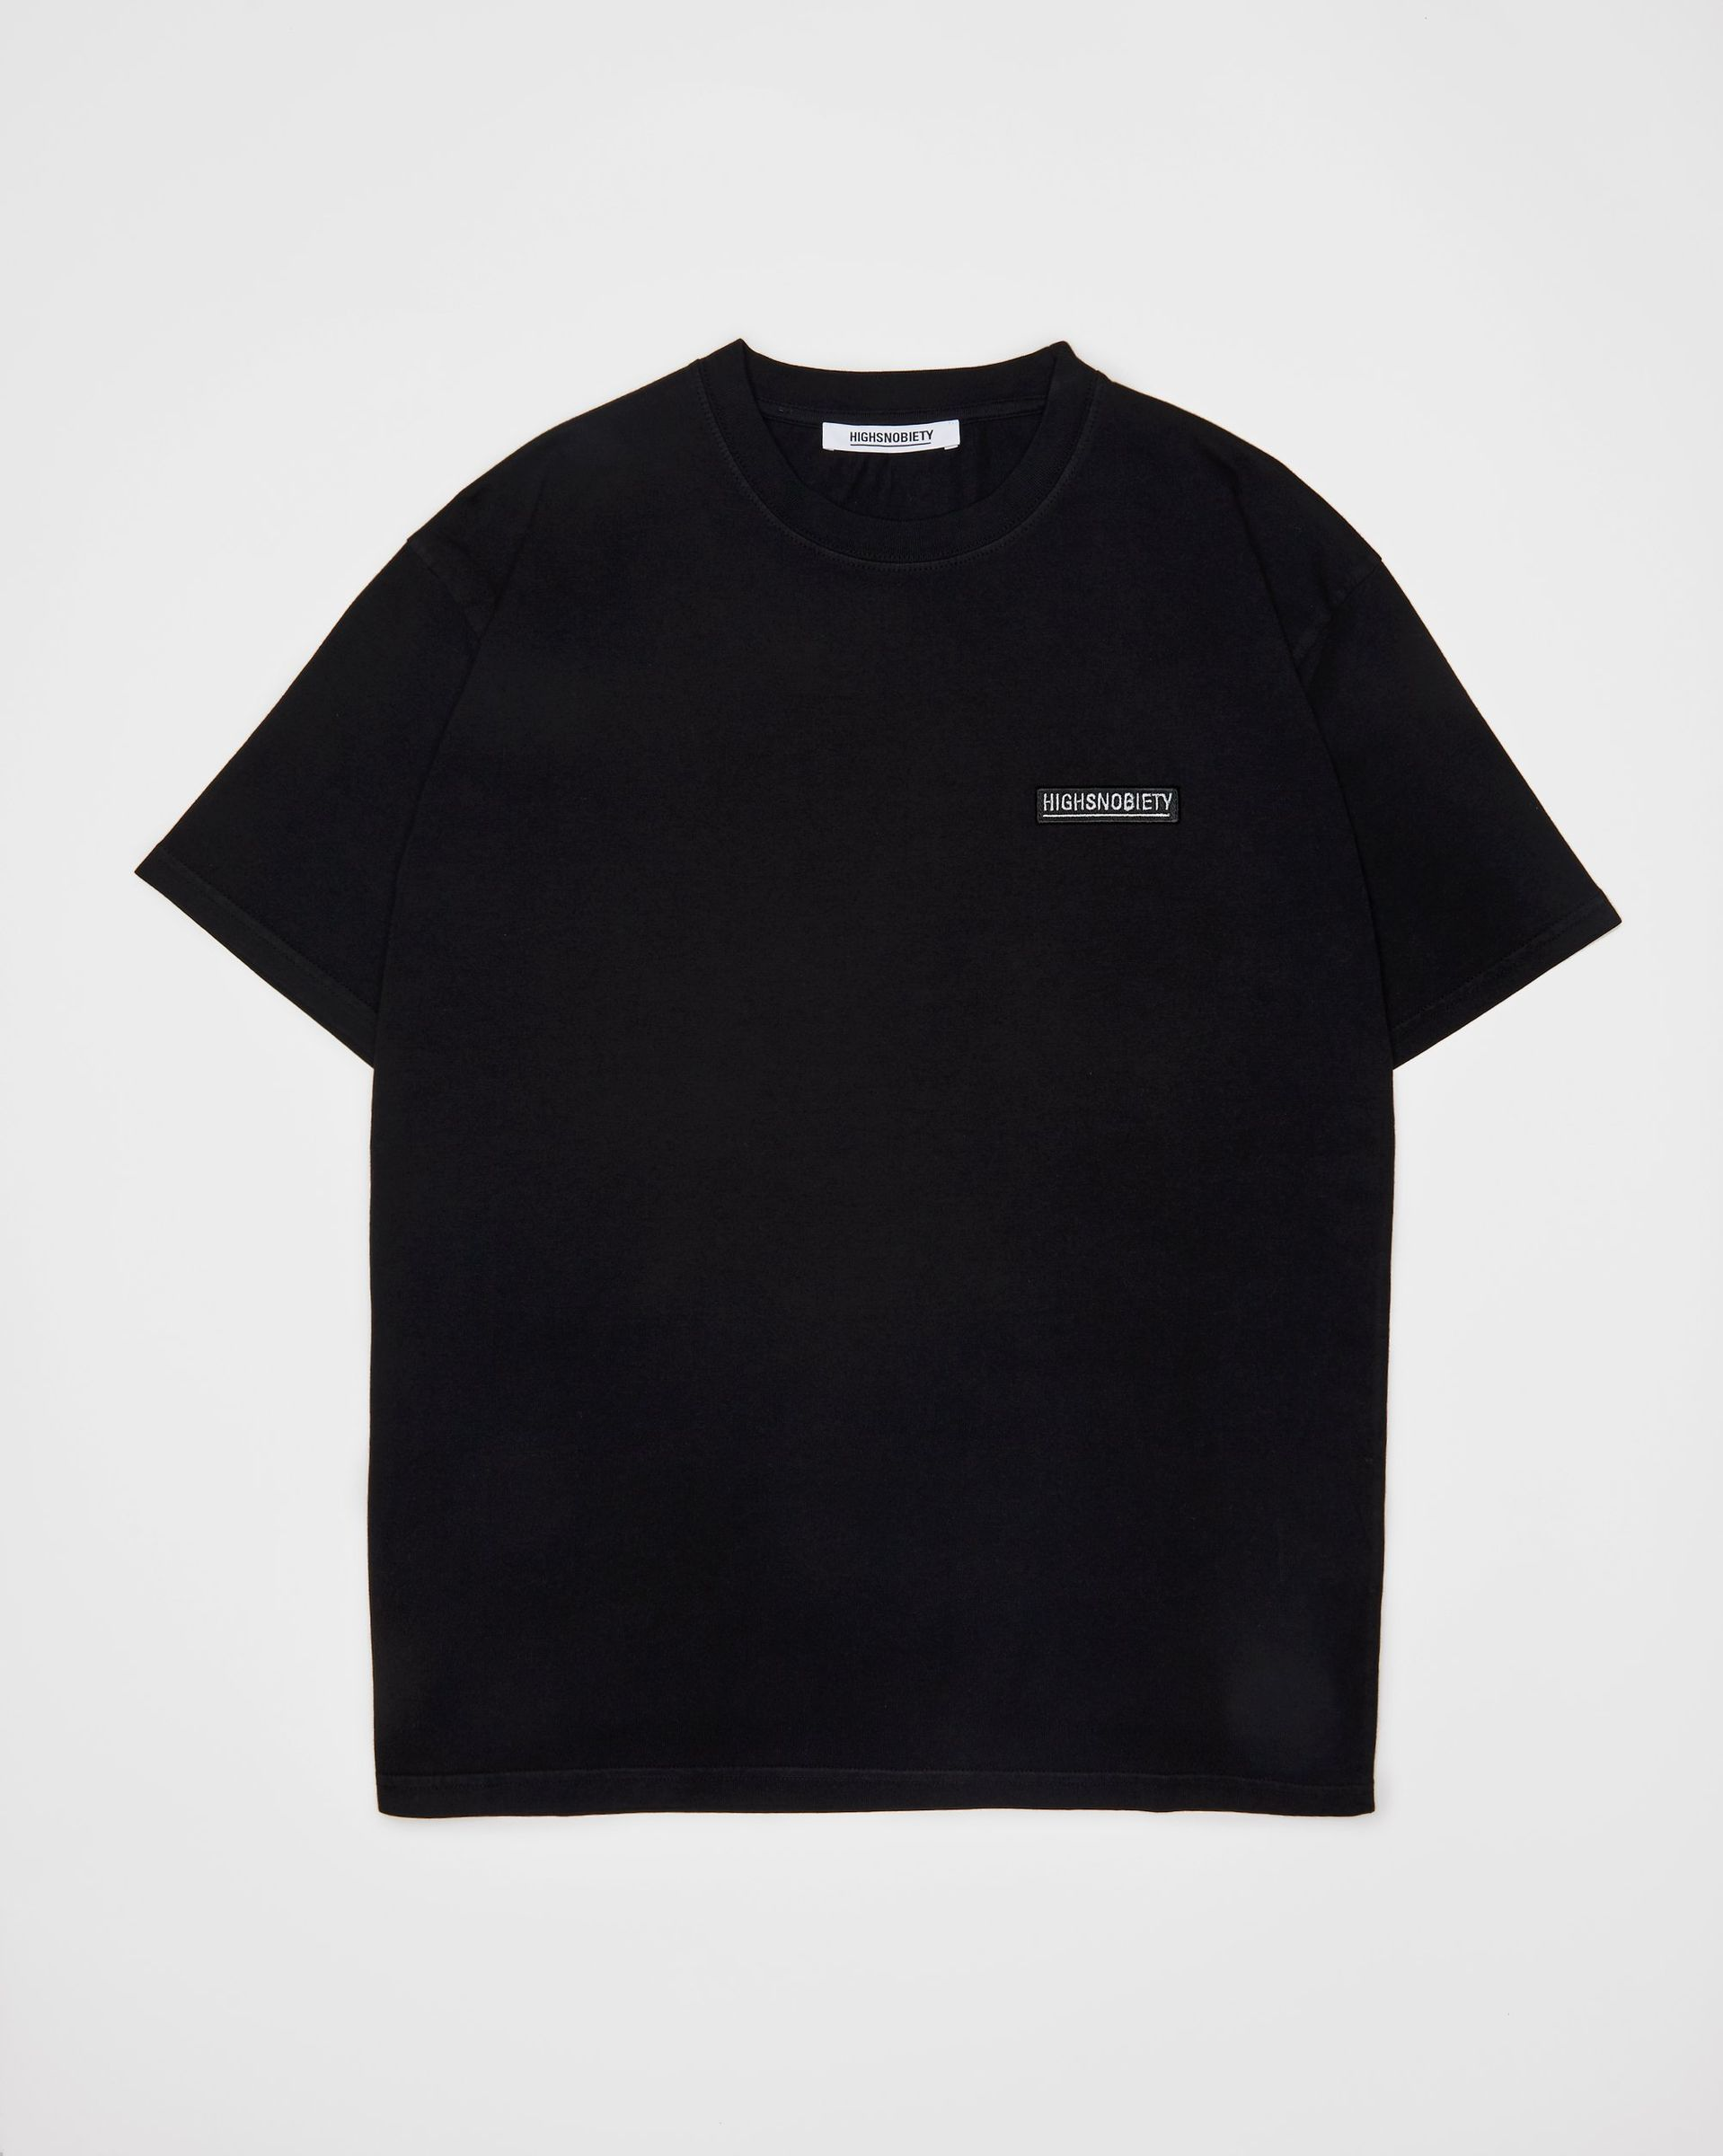 Highsnobiety Staples - T-Shirt Black - Image 1